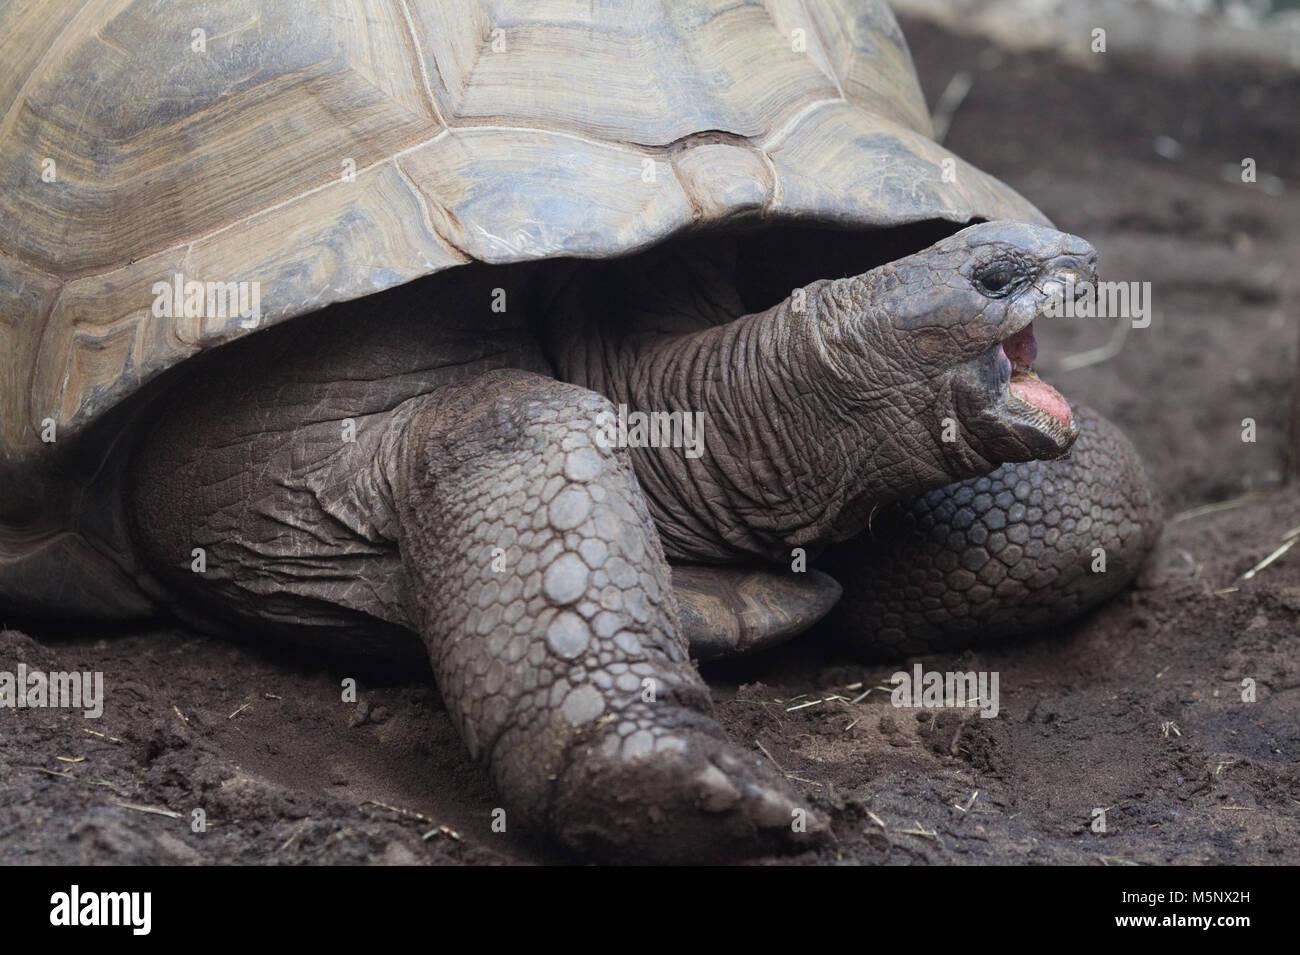 Aldabra tortuga gigante Imagen De Stock